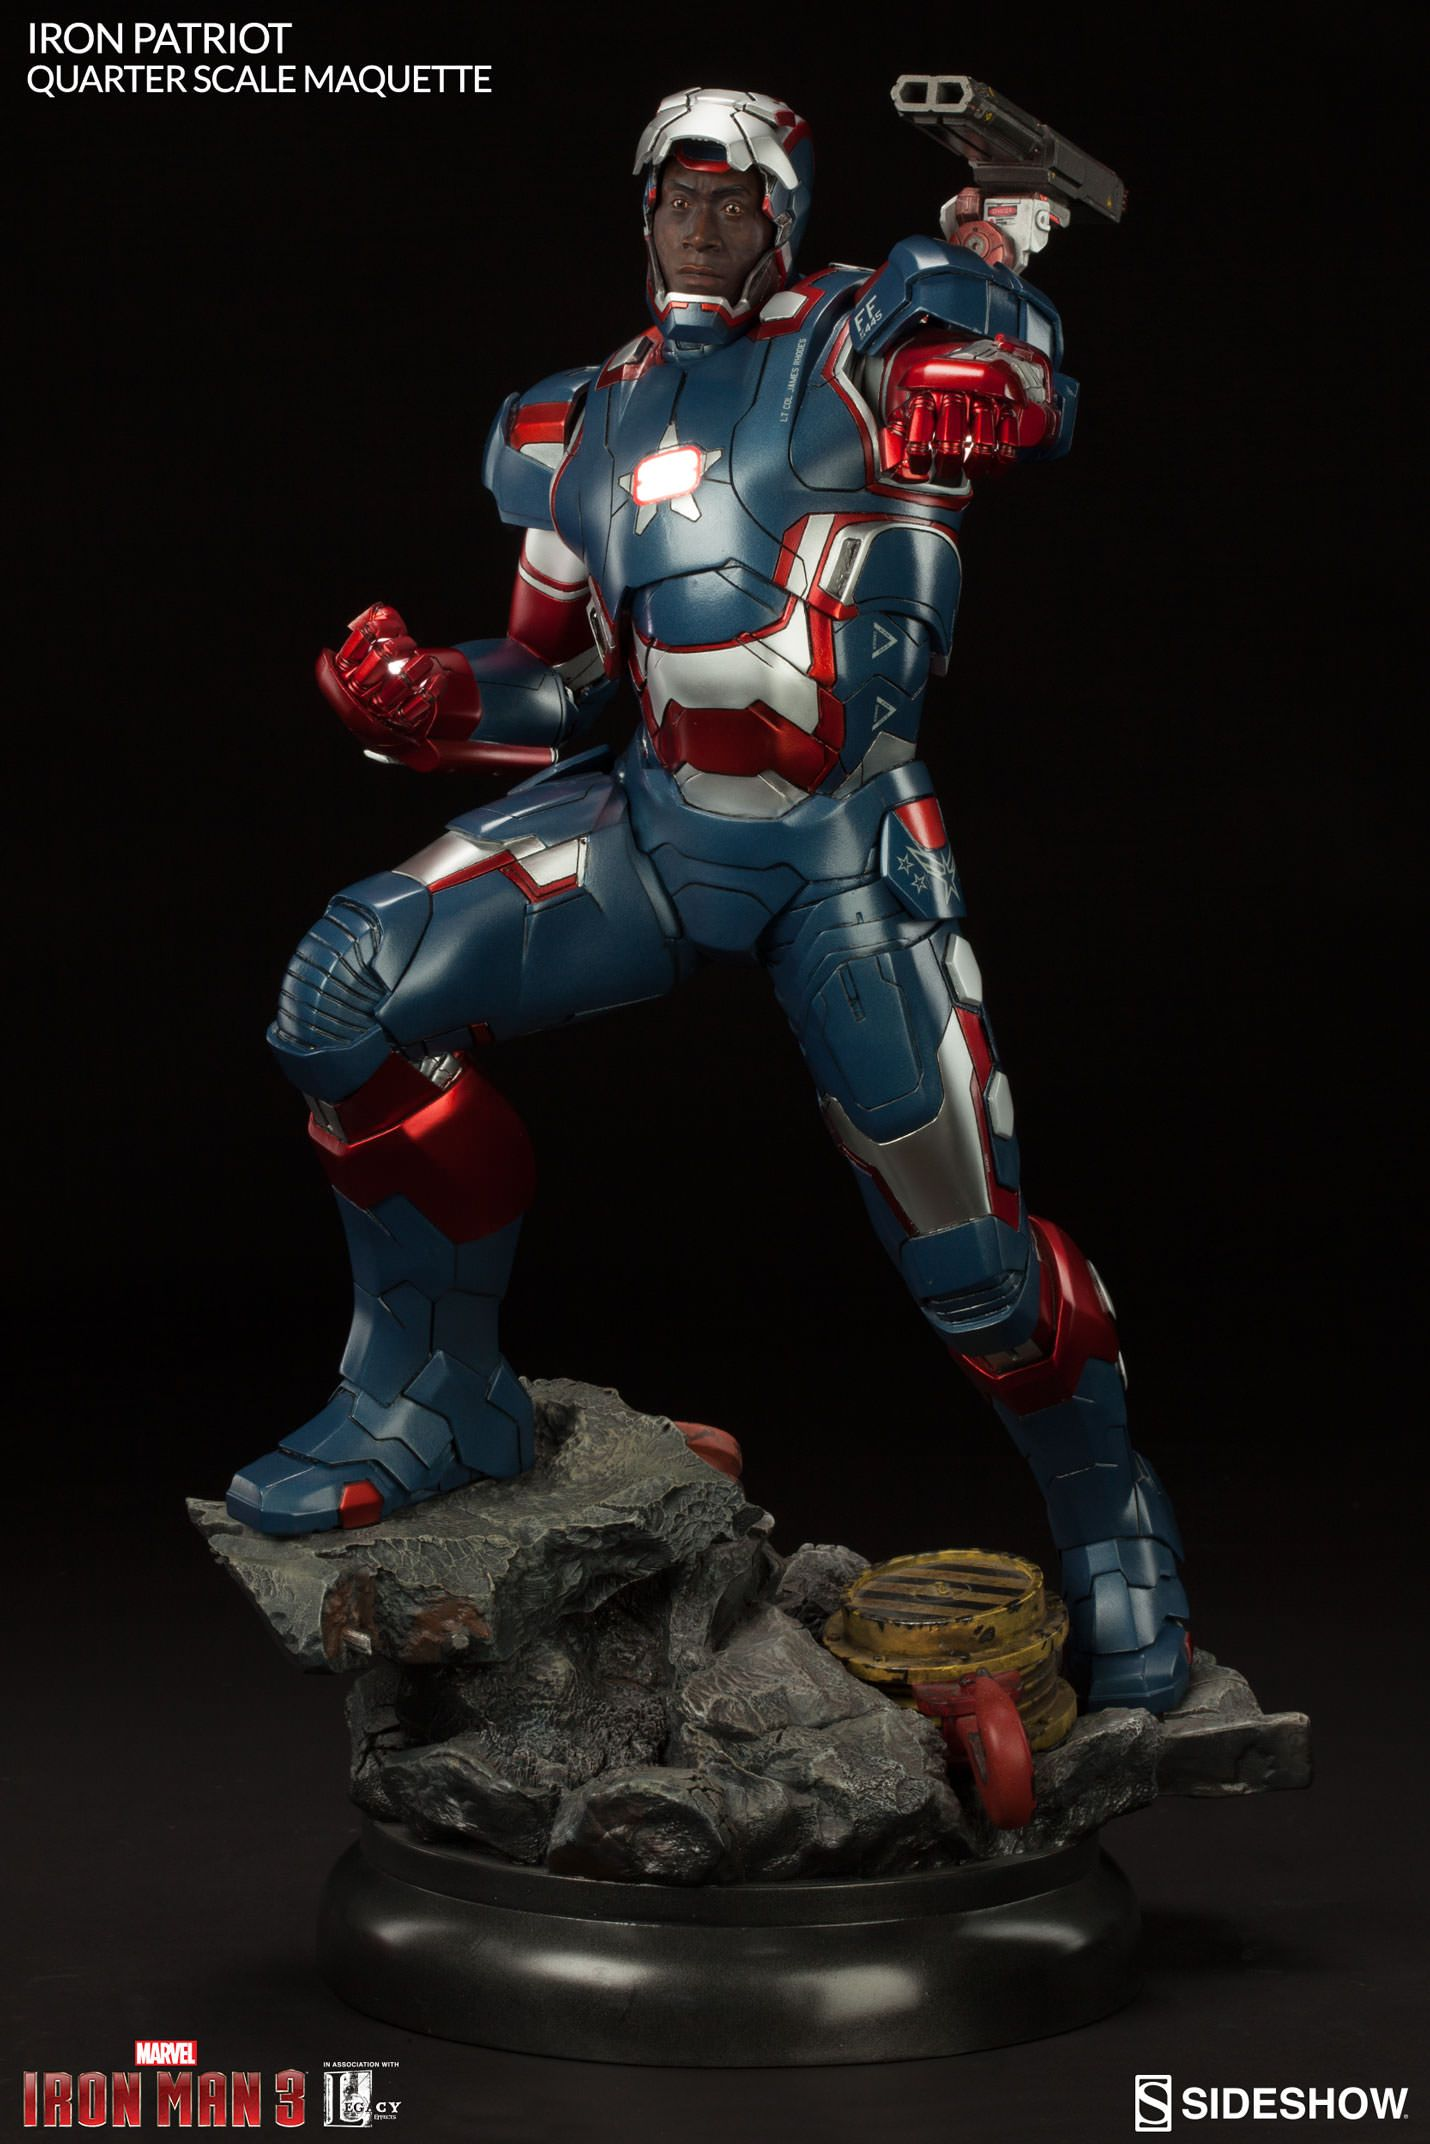 I Am Iron Man Snap Animated Art IPhone Wallpaper Iron